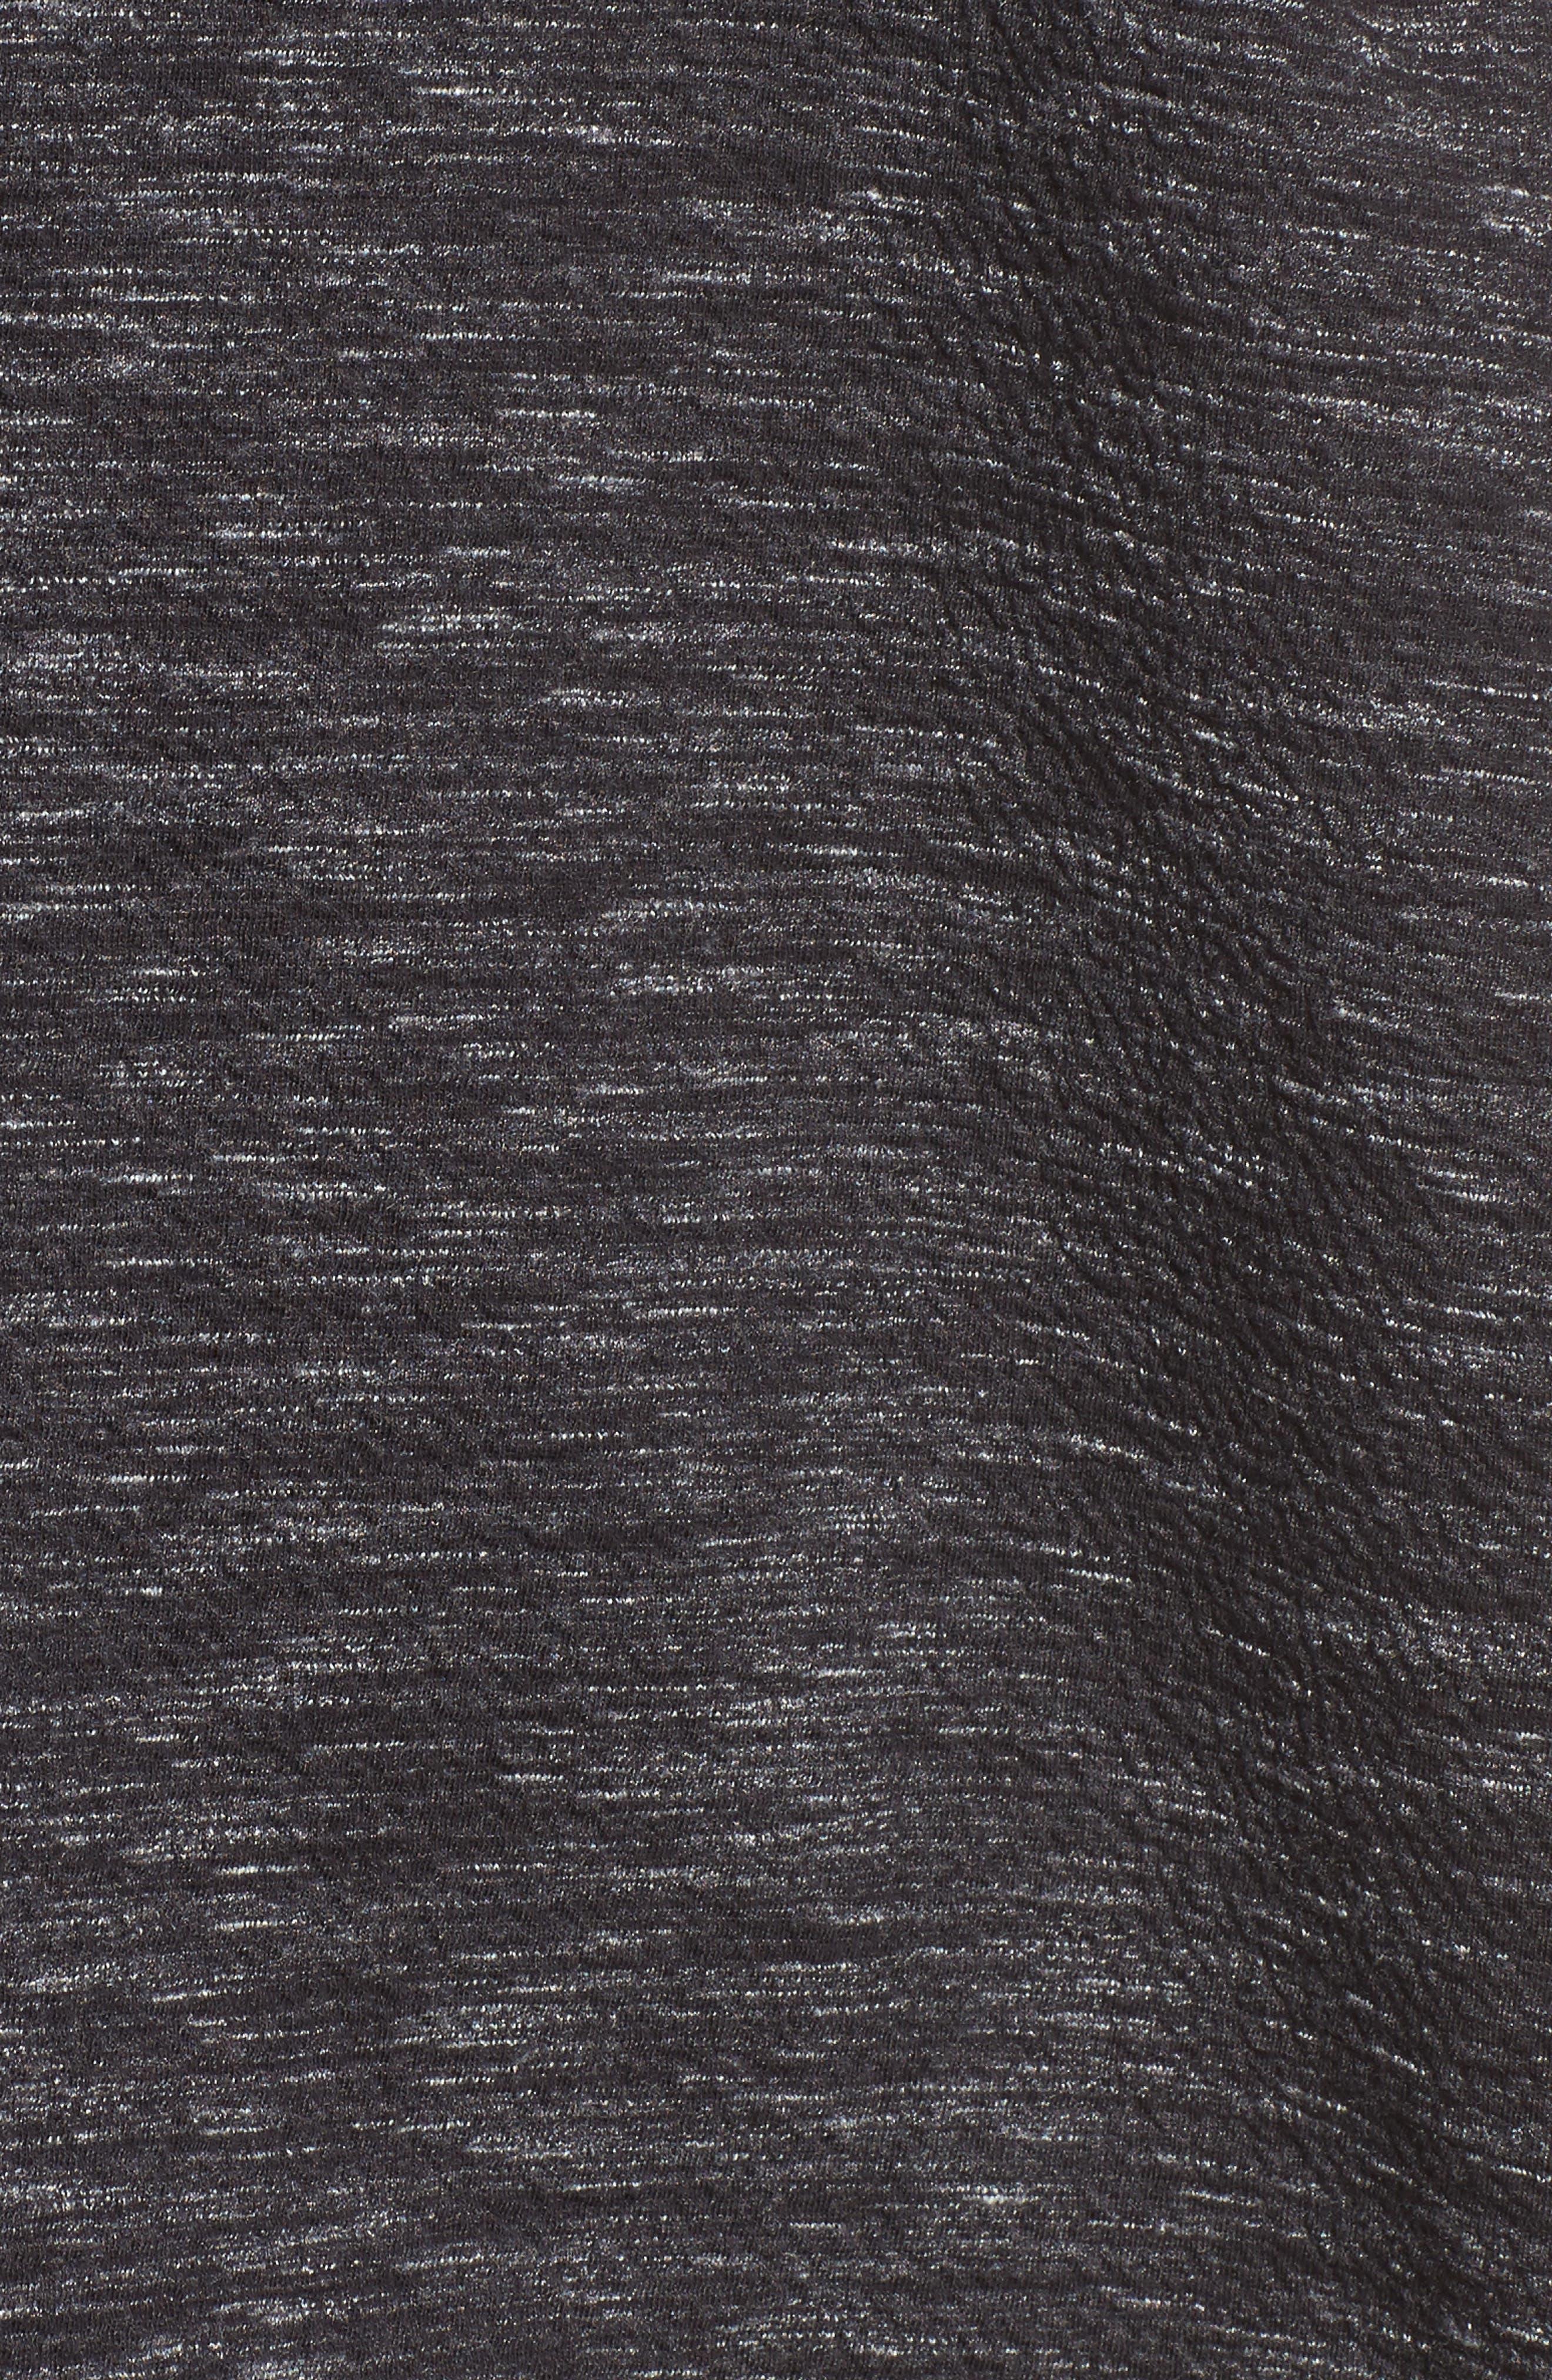 Reversible Marled Knit Jacket,                             Alternate thumbnail 5, color,                             021